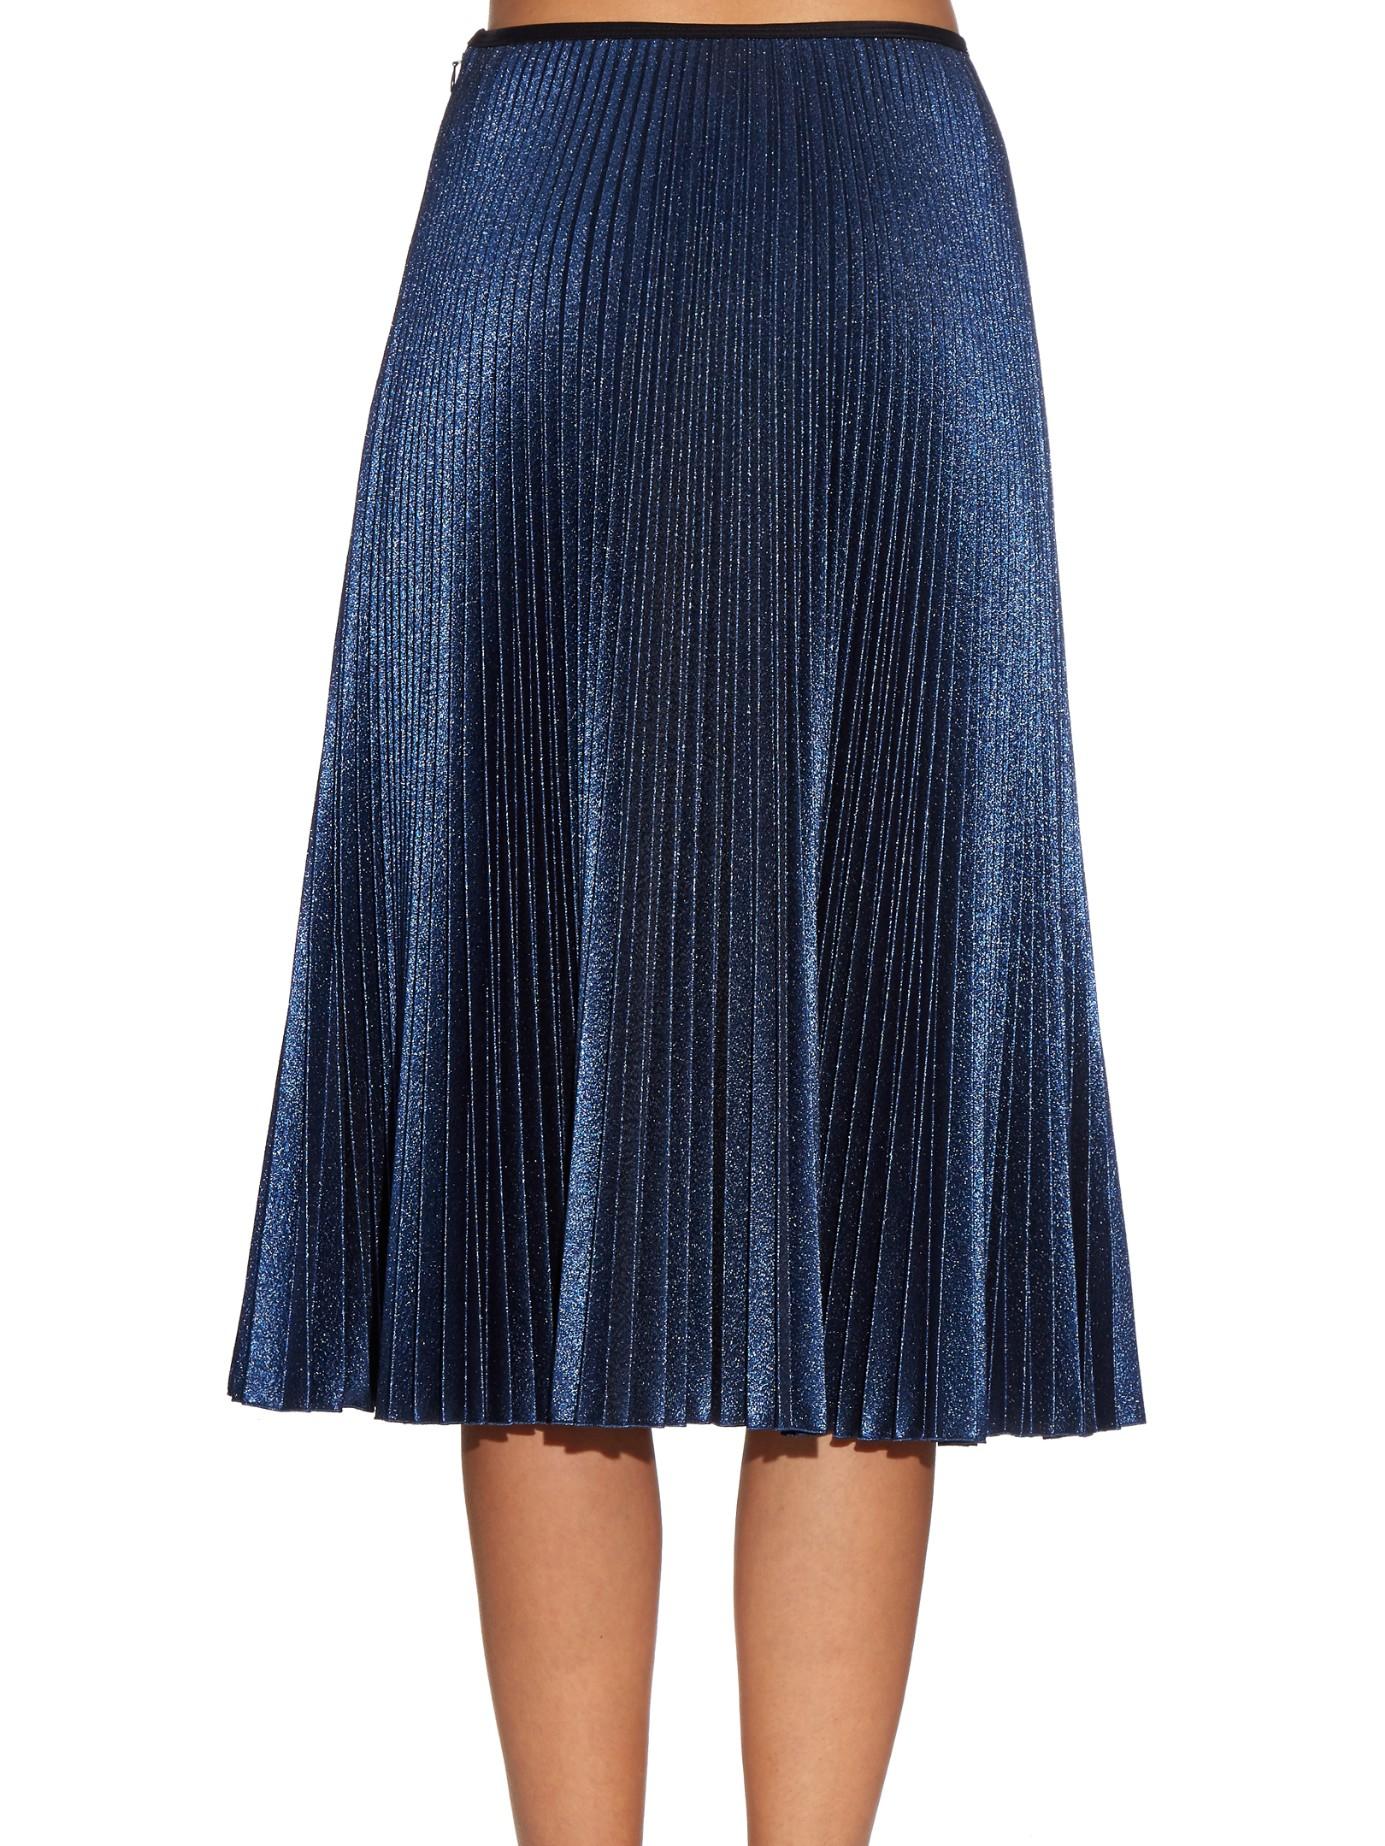 Electric blue pleated midi skirt – Fashionable skirts 2017 photo blog